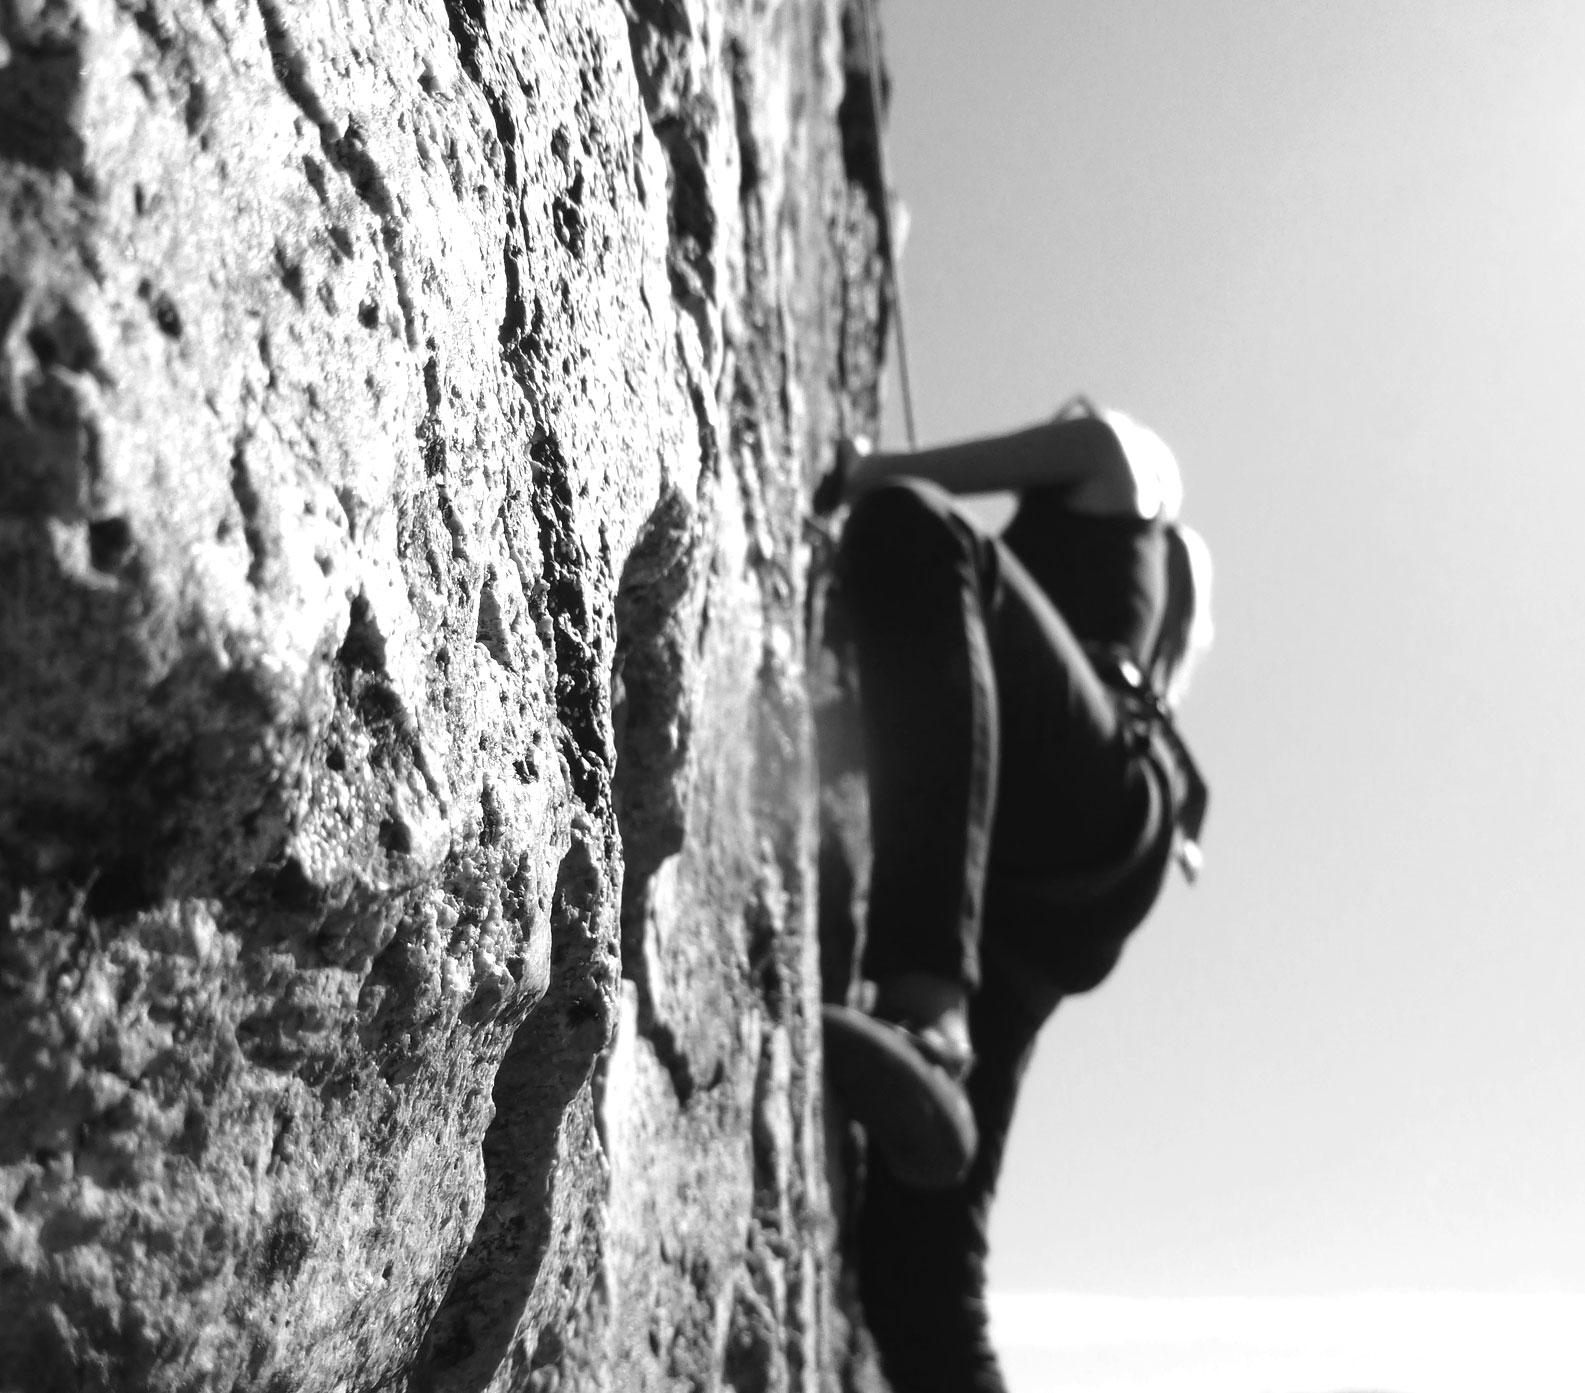 Climbing releases endorphins thatmake me feel happy!